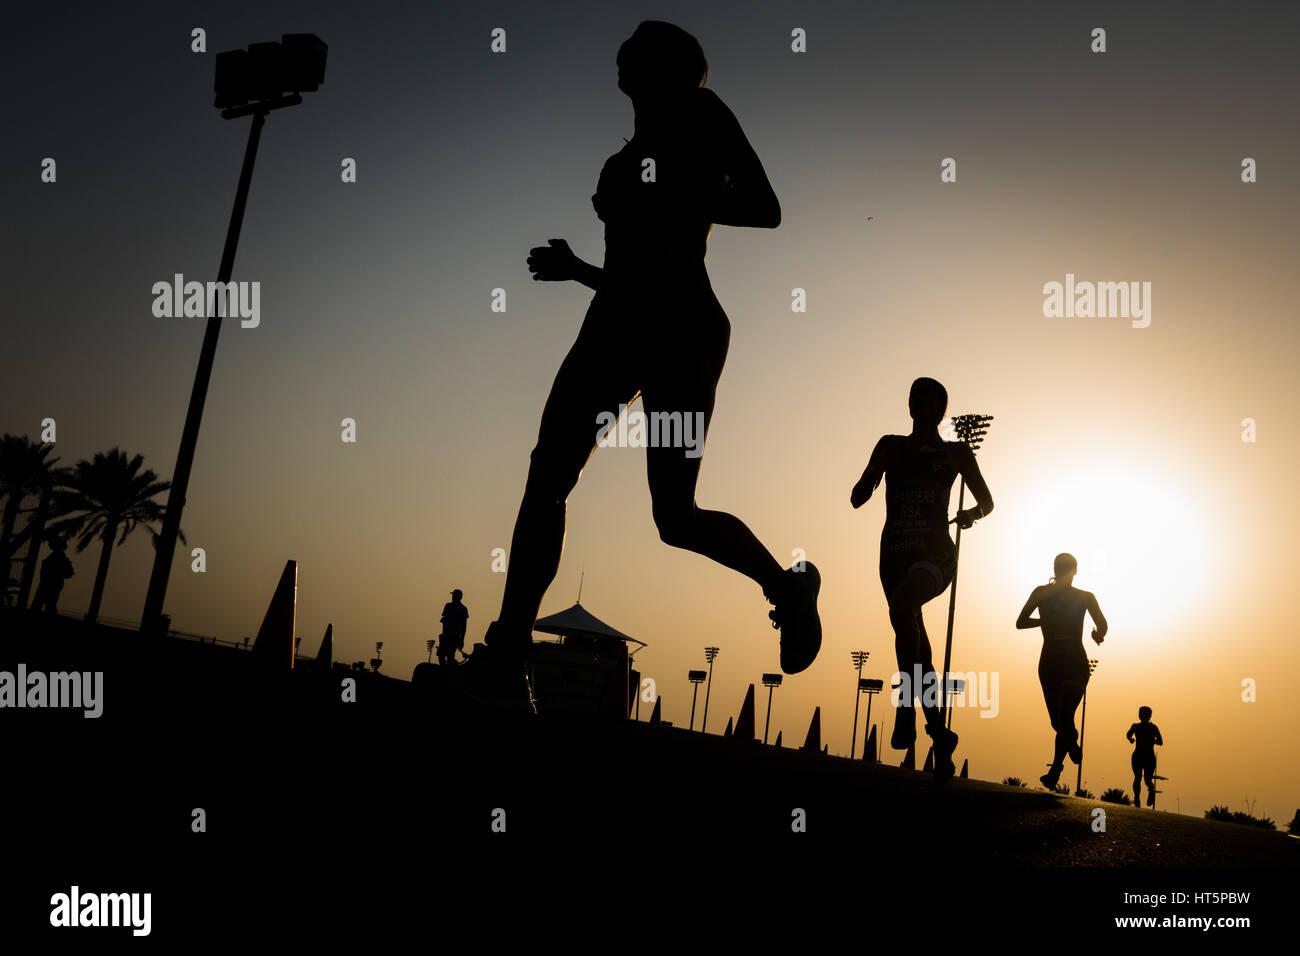 TriathlonFoto Stock